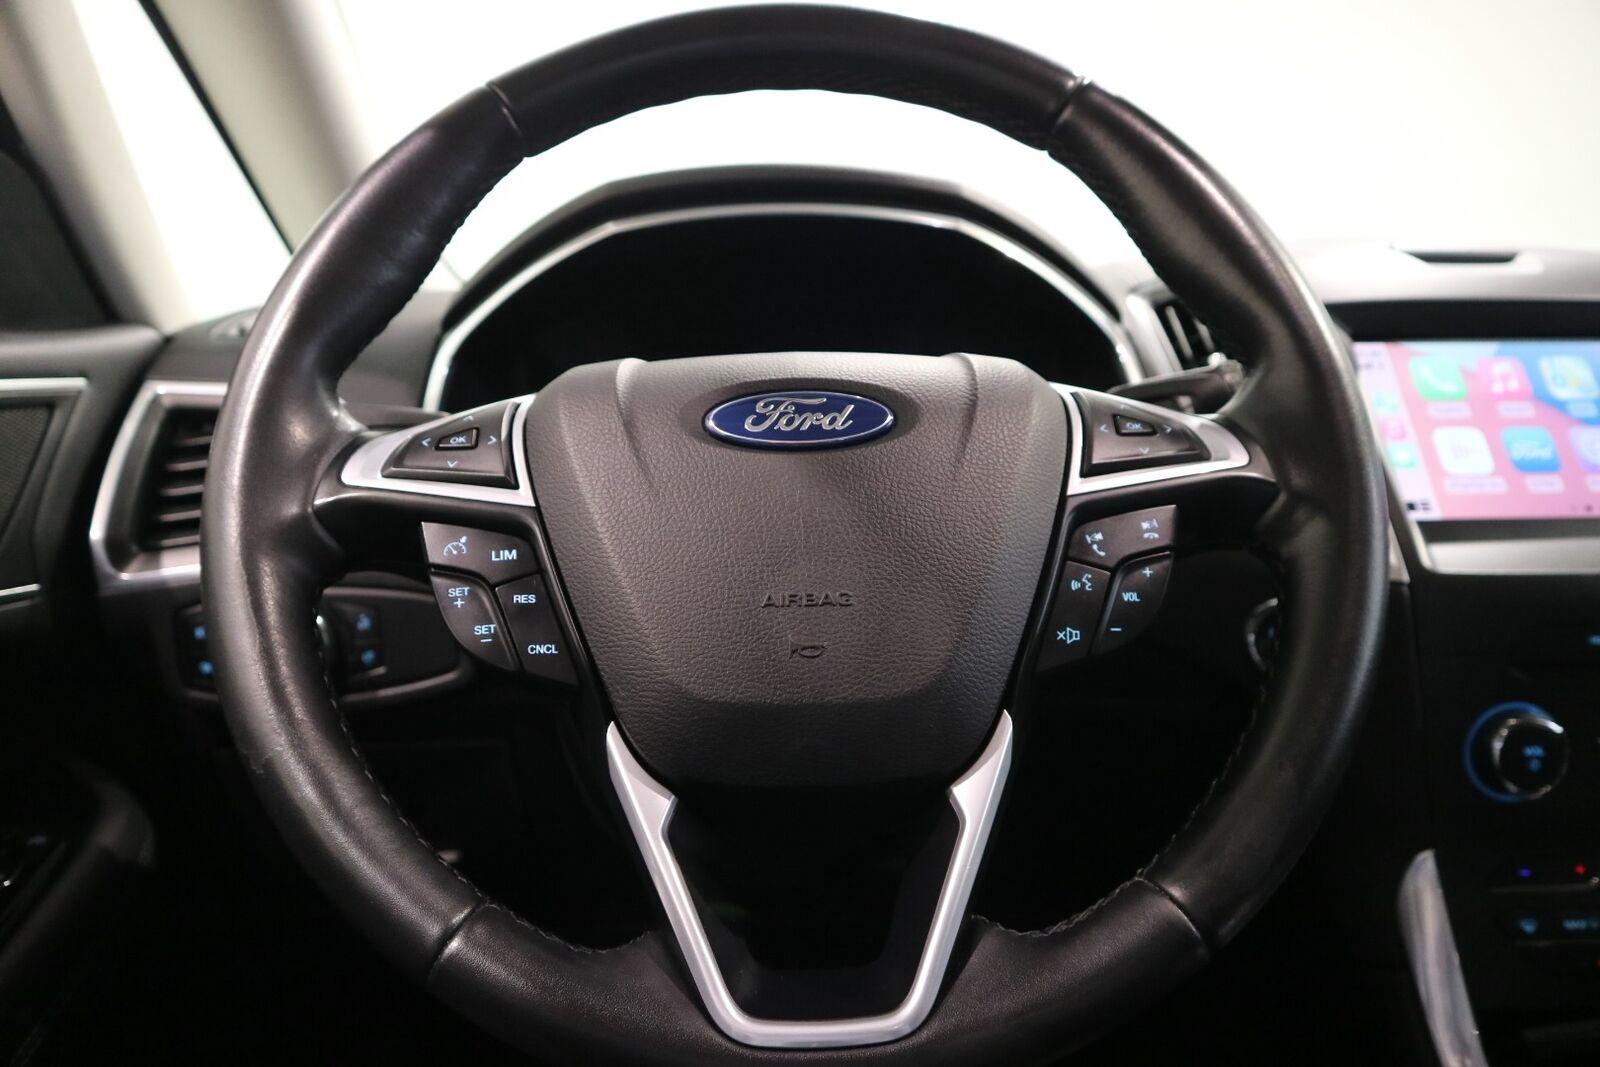 Ford Galaxy 2,0 TDCi 180 Titanium aut. - billede 3